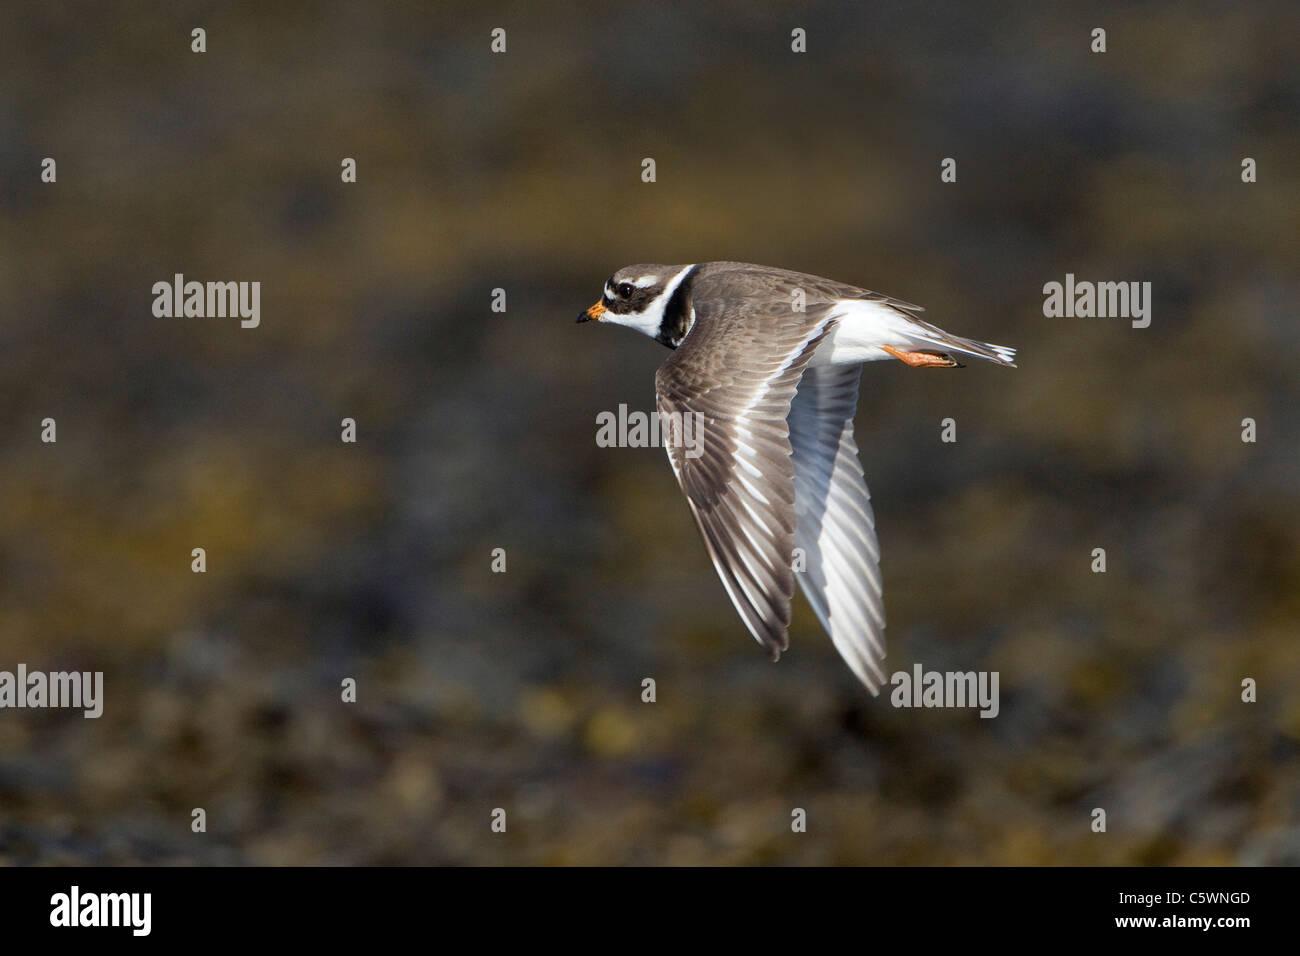 Flussregenpfeifer-Regenpfeifer (Charadrius Hiaticula), Erwachsene im Sommer Gefieder im Flug. Island. Stockbild